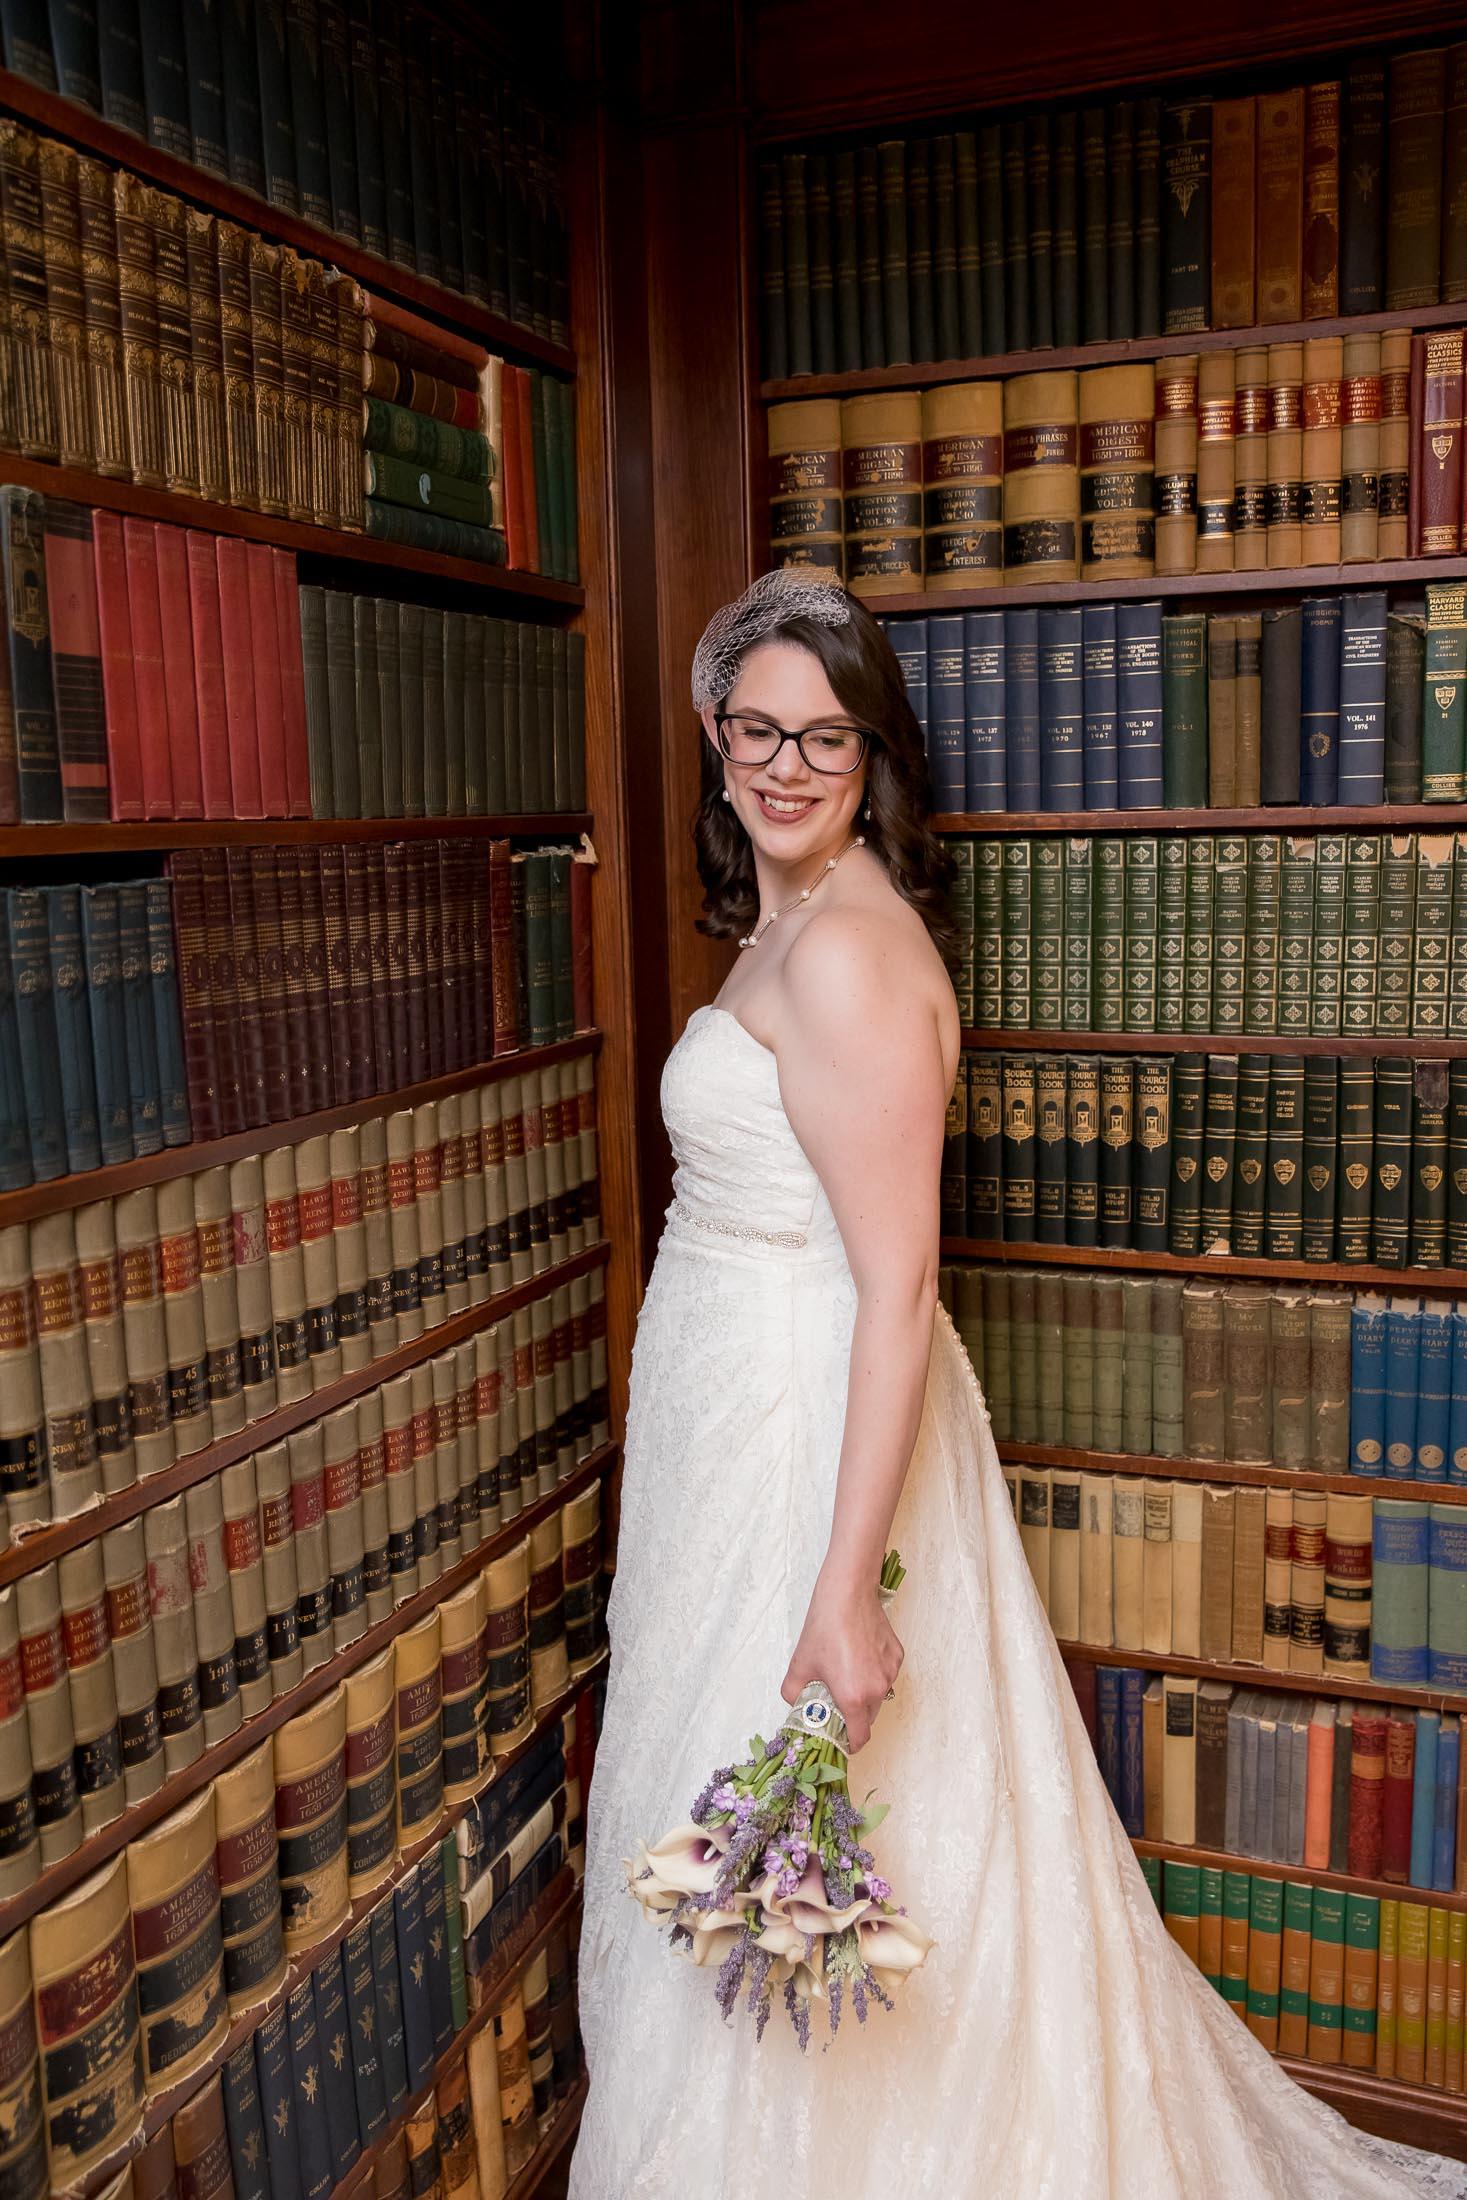 library, bridal portrait, wedding, tracy jenkins photography, publick house, Massachusetts, new england,  photography